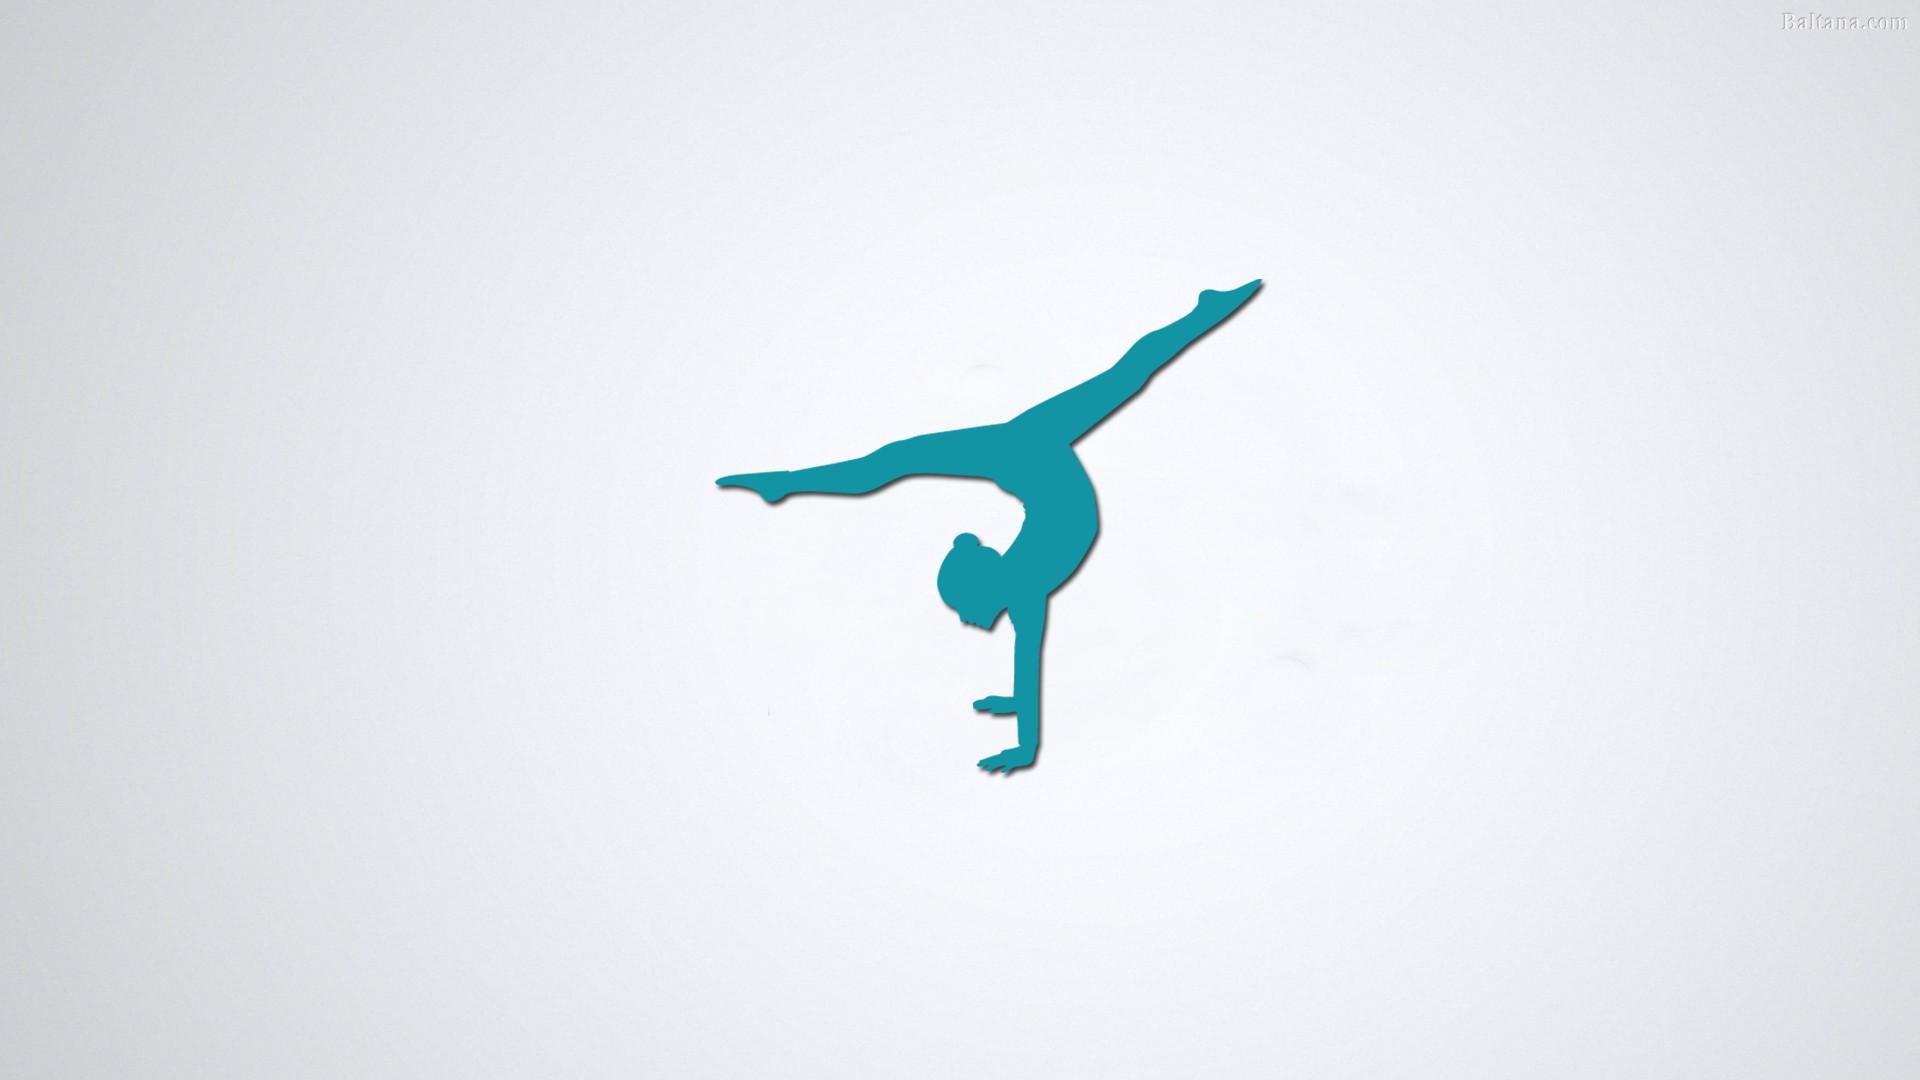 Gymnastics Wallpapers 28 images   DodoWallpaper 1920x1080